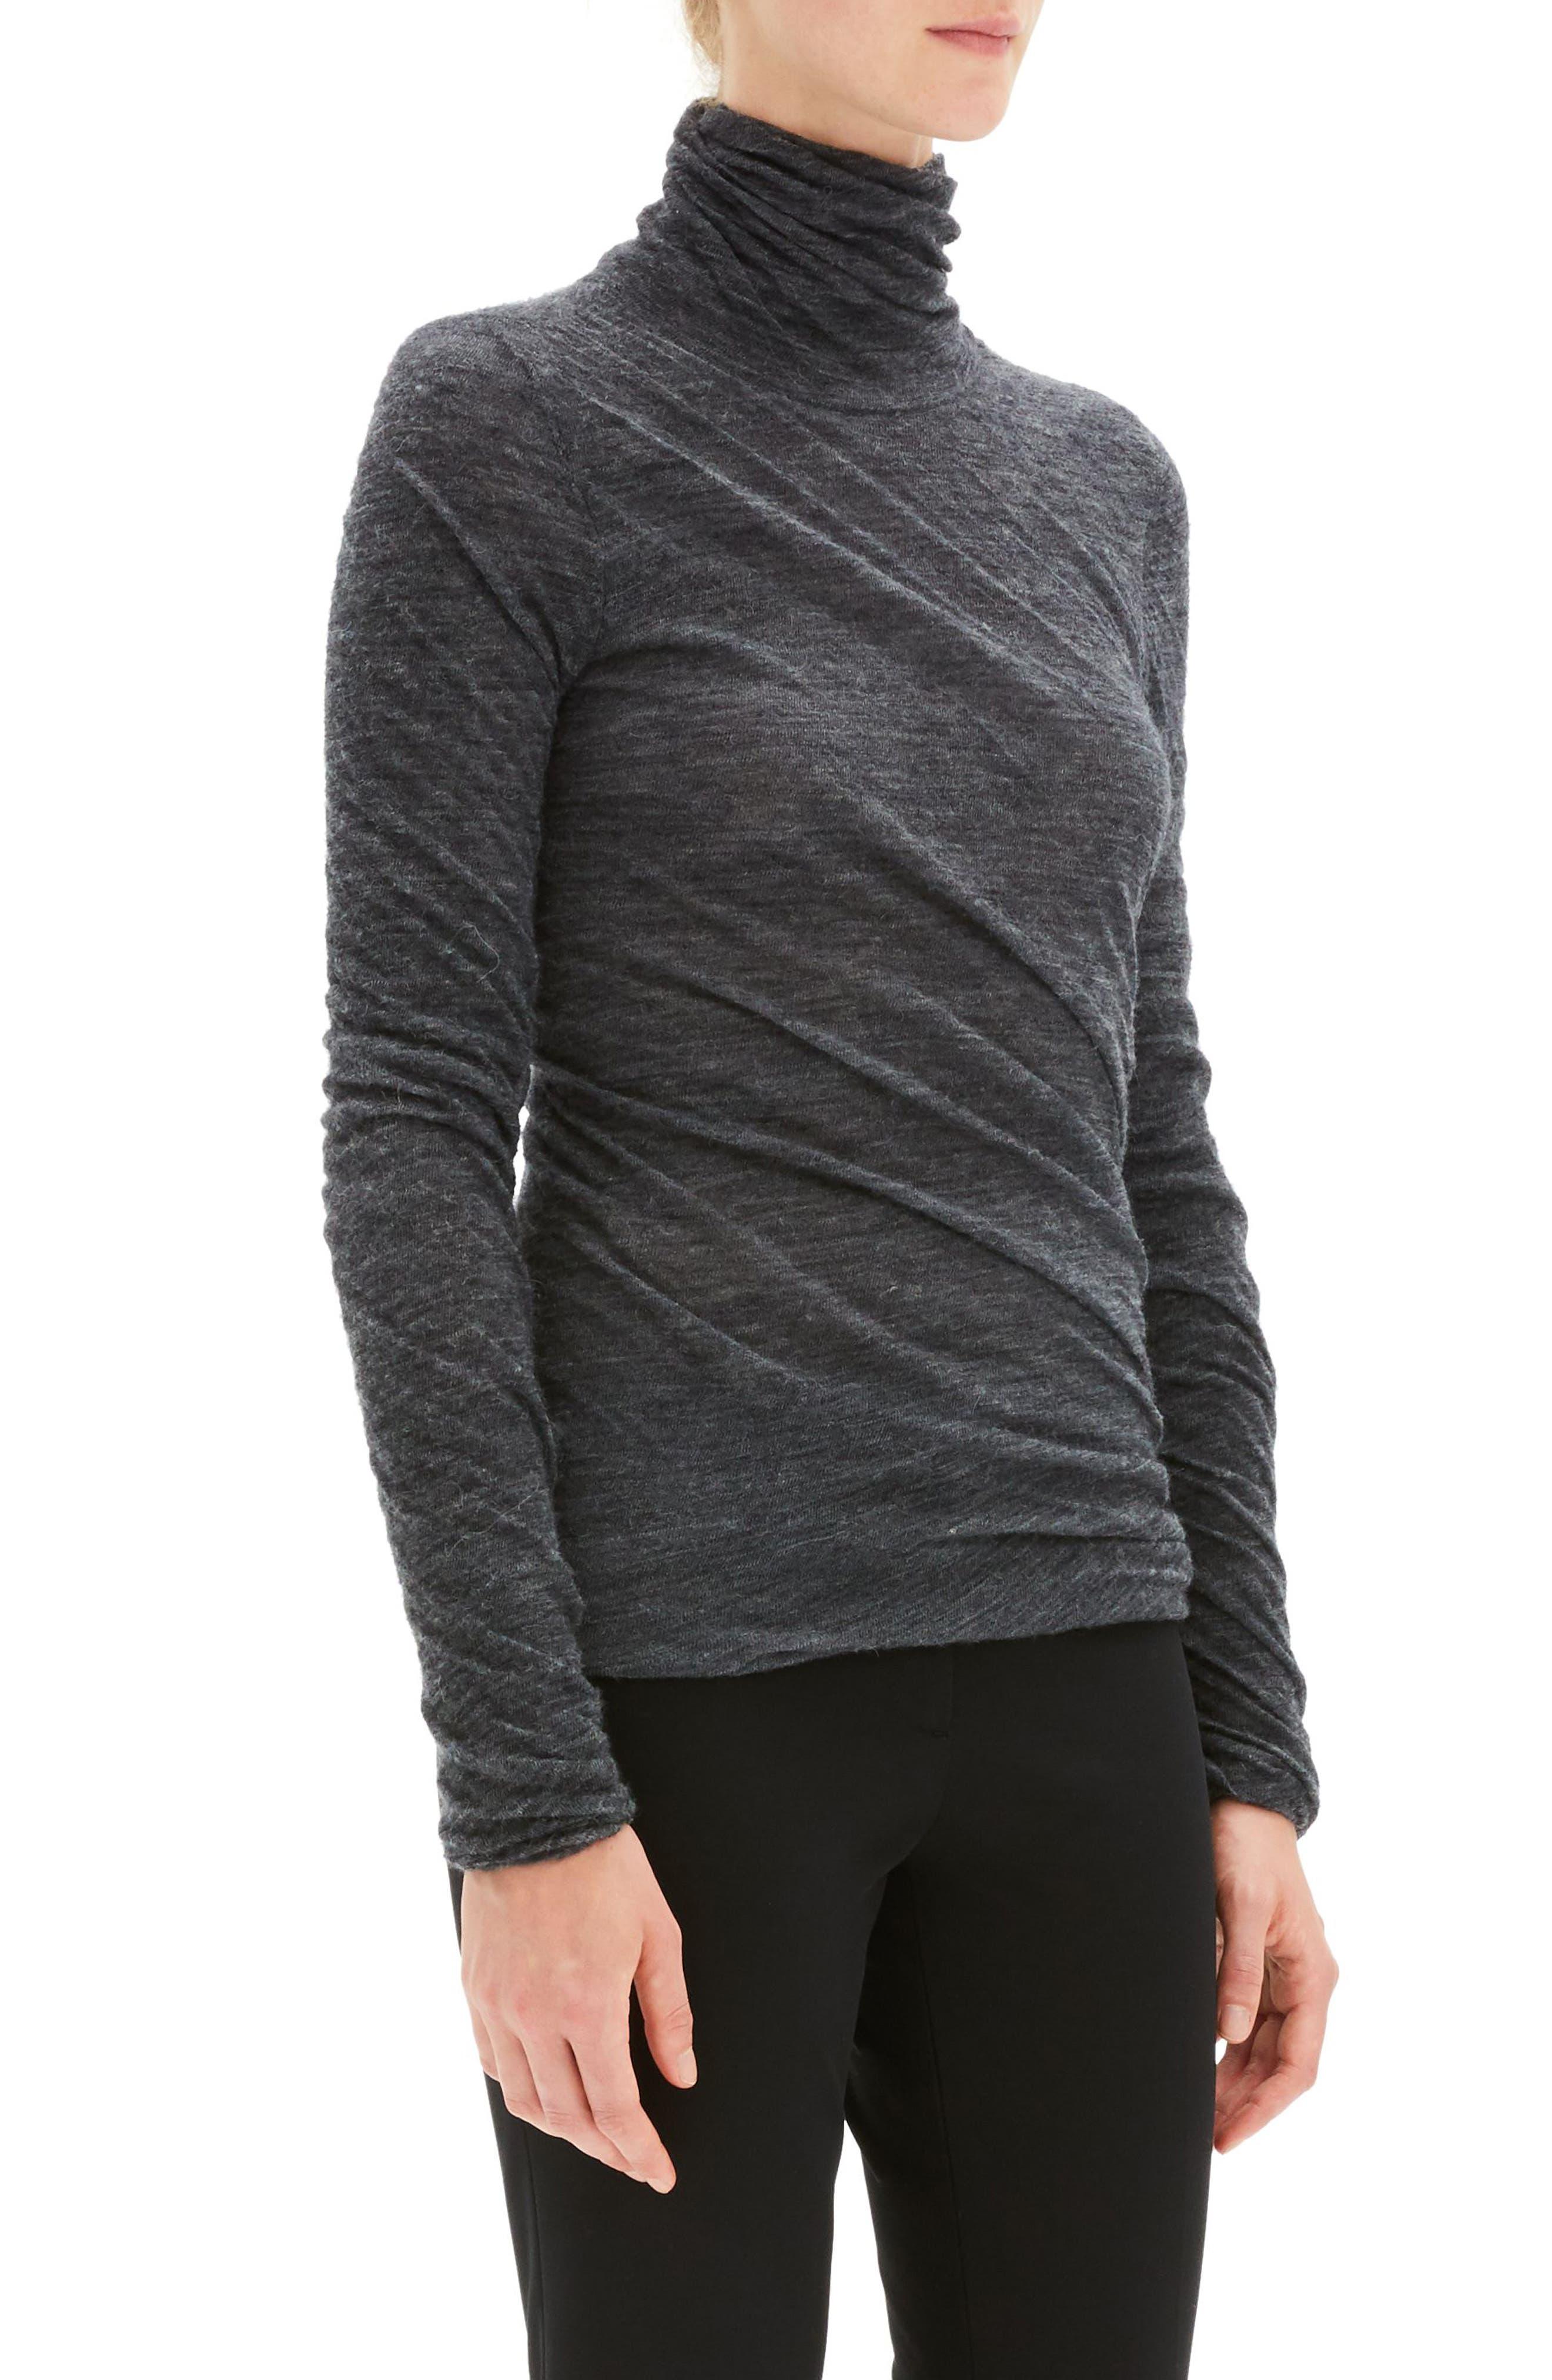 Twist Turtleneck Sweater,                             Alternate thumbnail 3, color,                             030